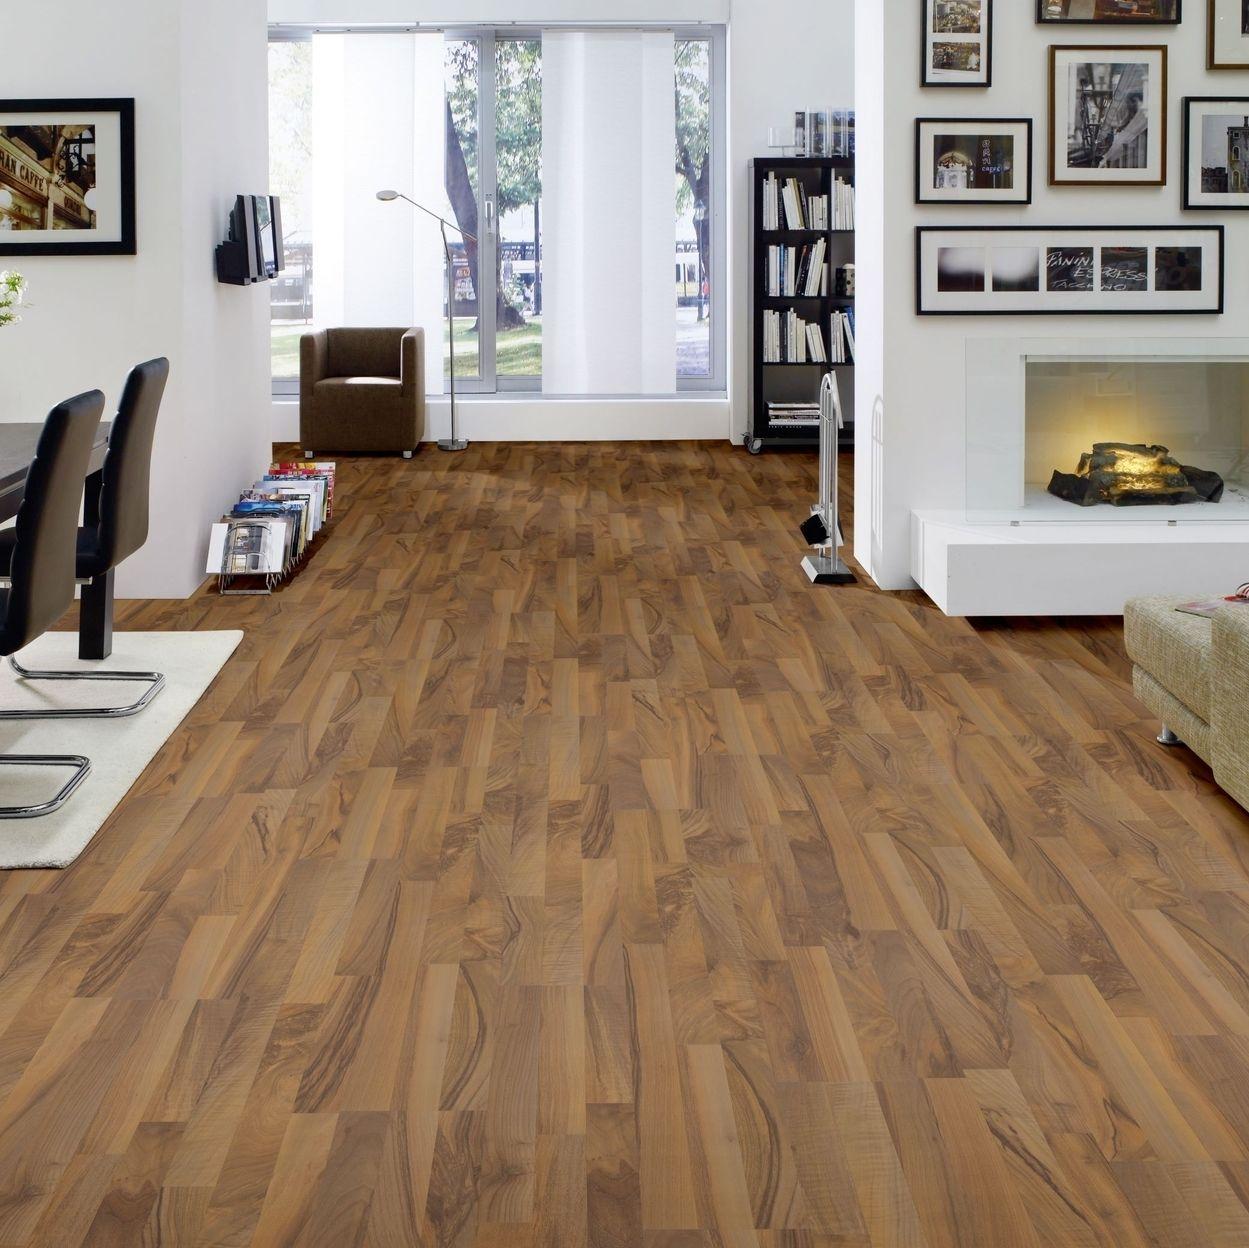 hori klick laminat selection nussbaum schiffsboden optional d mmung leisten ebay. Black Bedroom Furniture Sets. Home Design Ideas